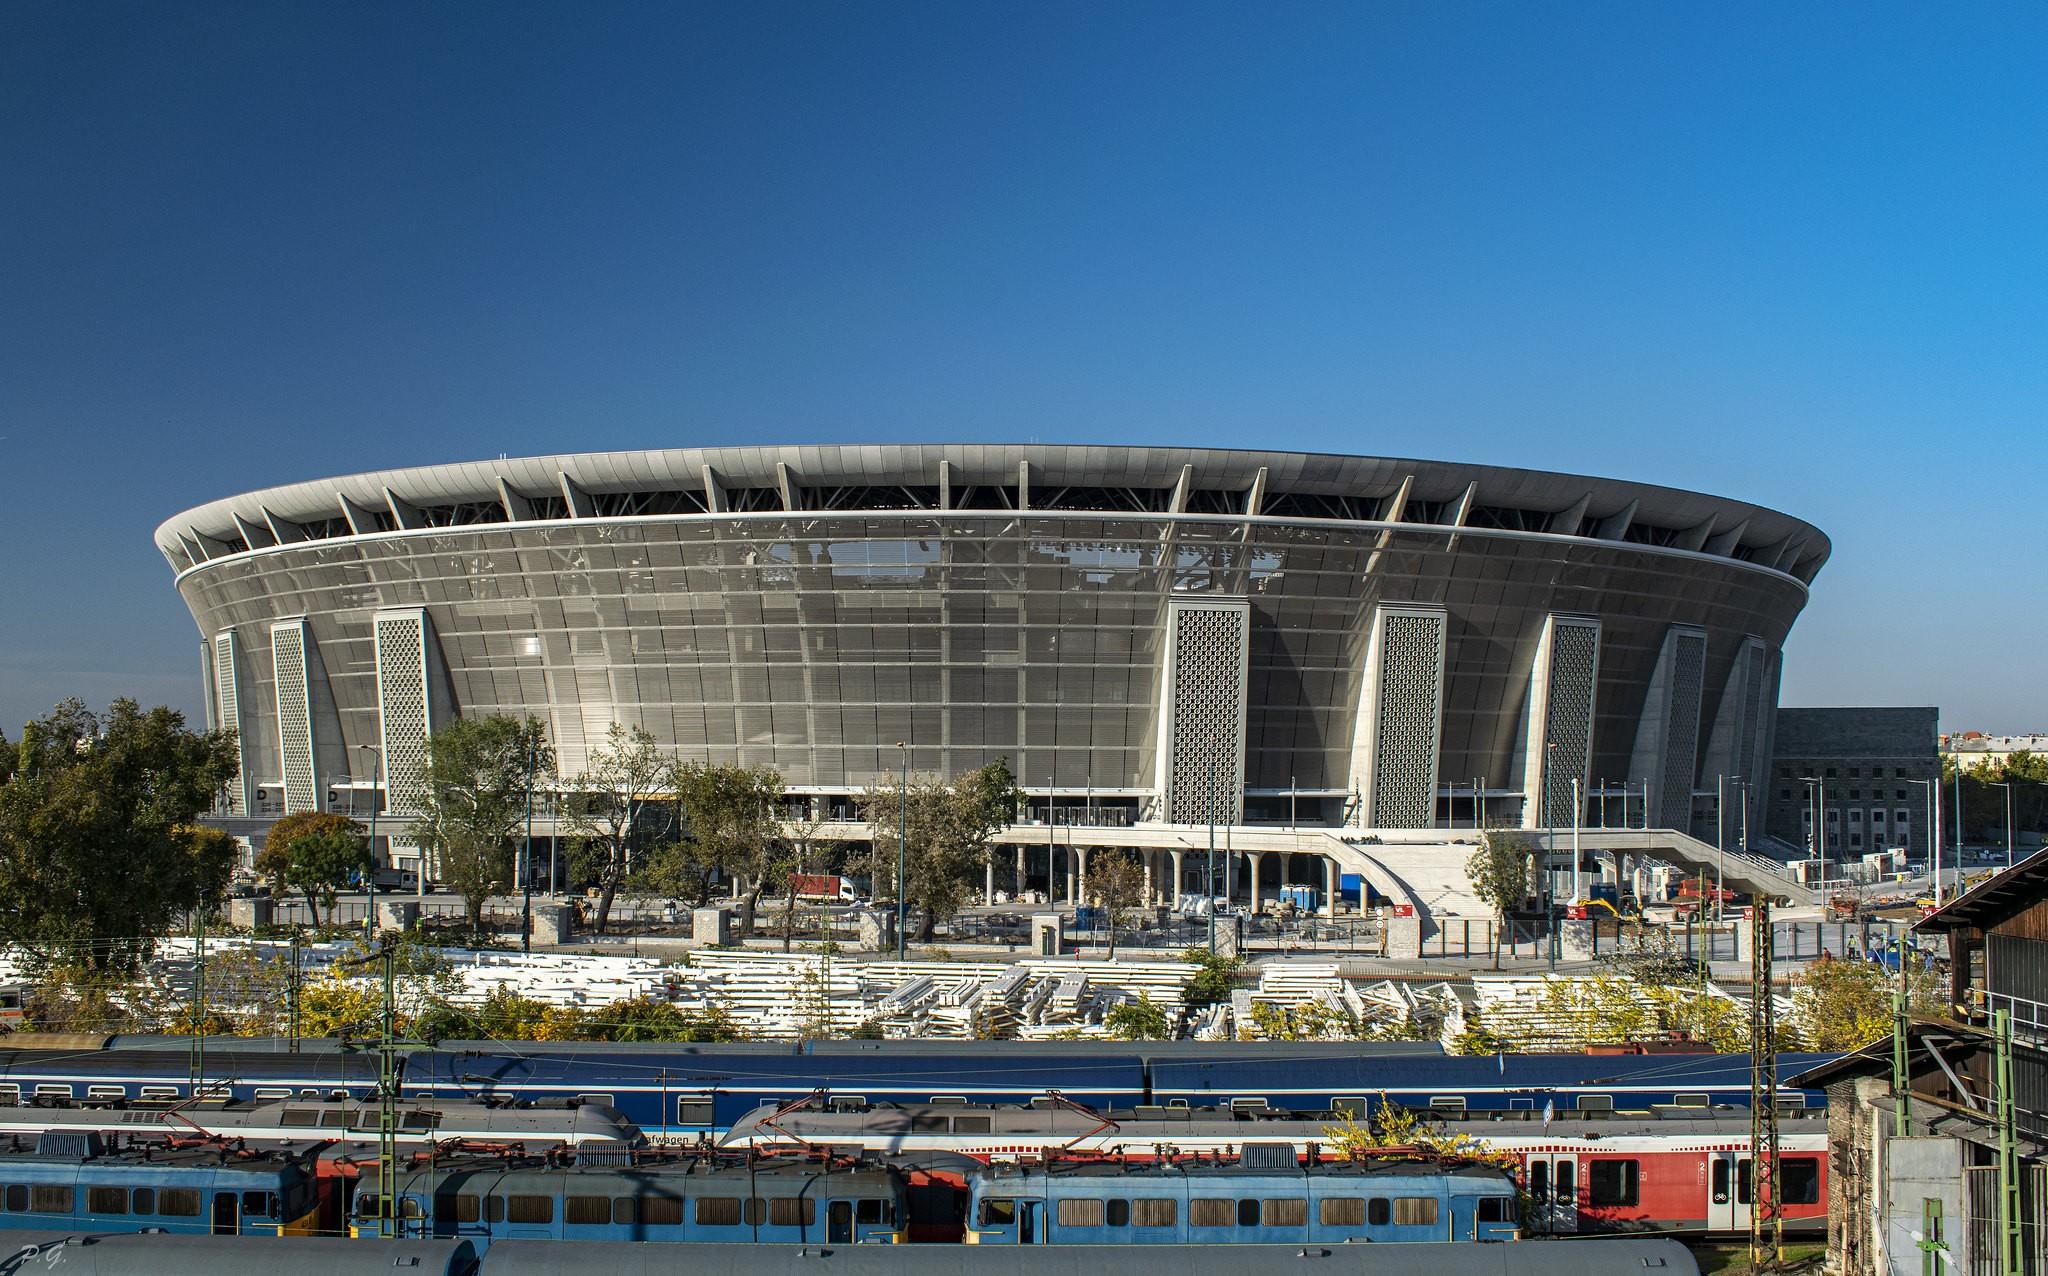 Stadion Ferenc Puskas / Puskas Arena